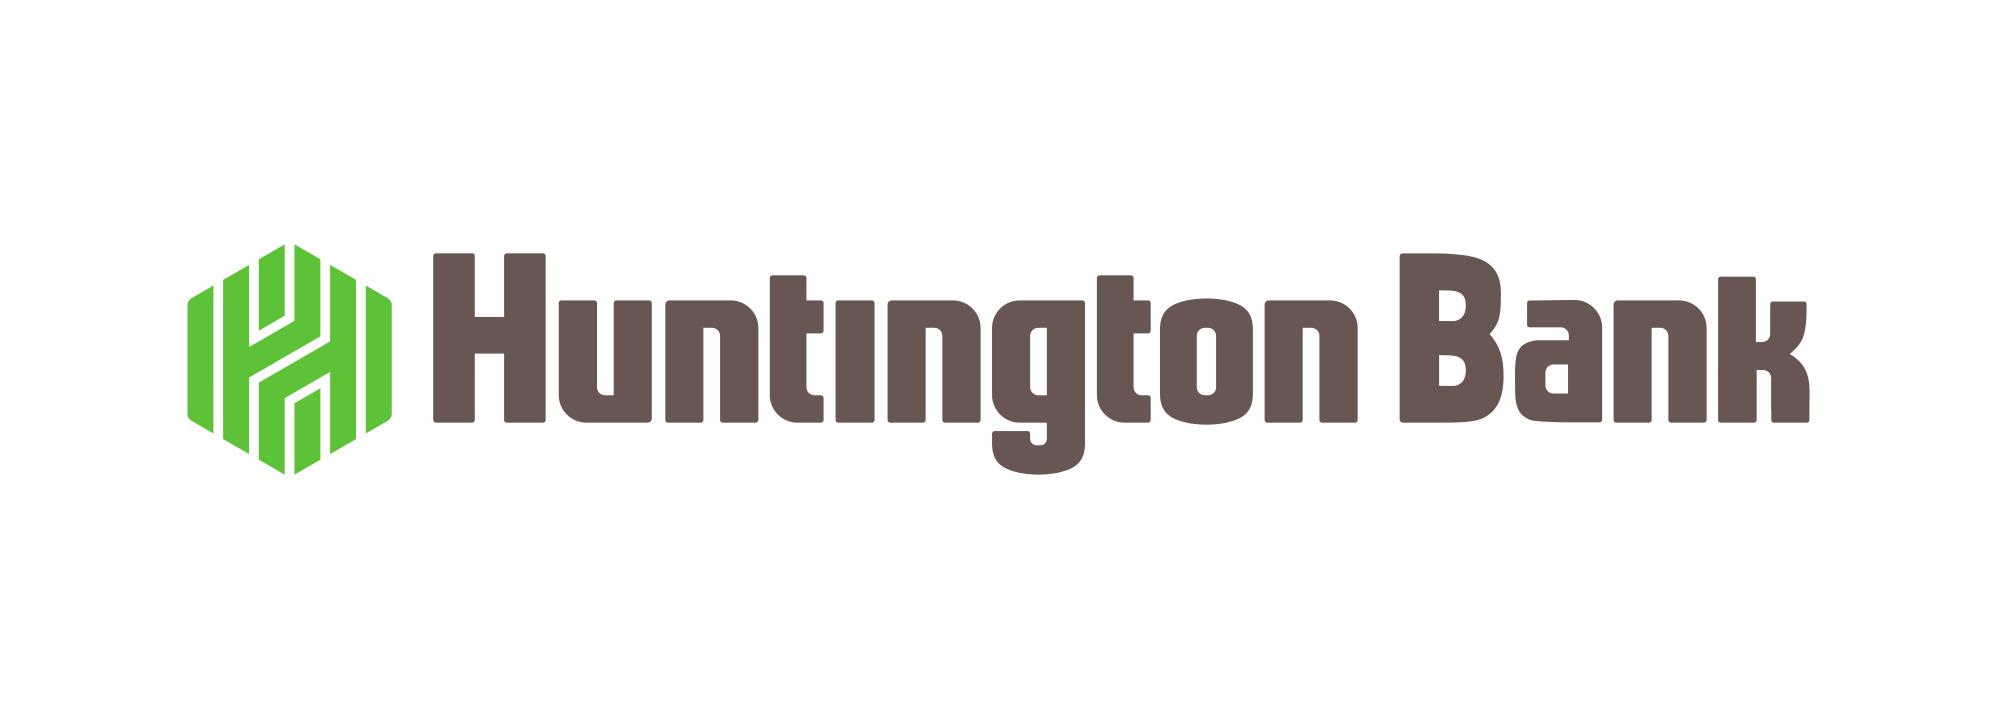 huntingtonnationalbanklogo